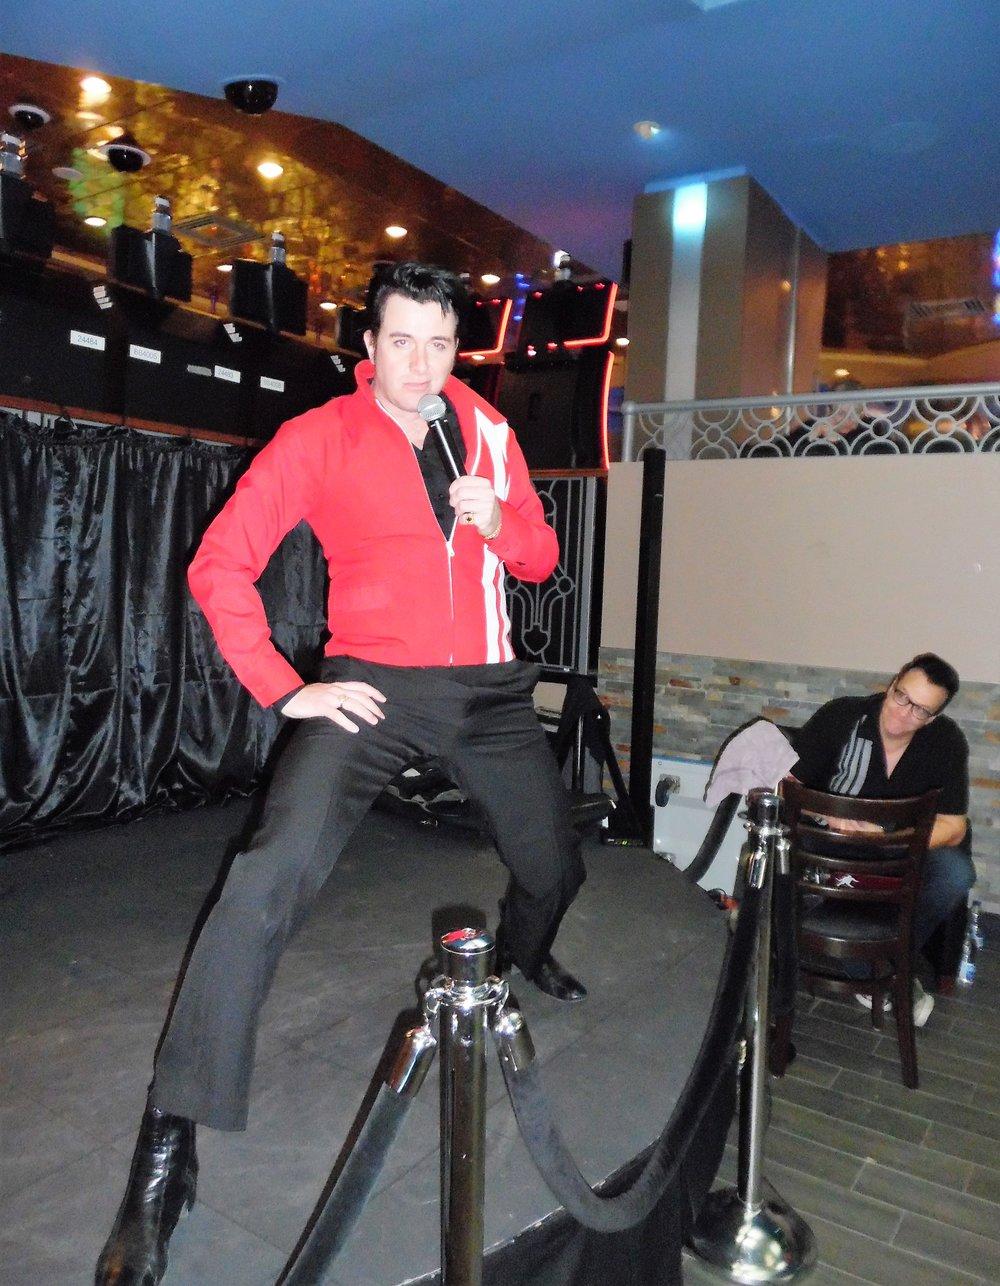 ETA  Matt Cage  strikes a pose at Flamboro Downs as an amused ETA Brent Freeman looks on.  Photo Credit: C.M.